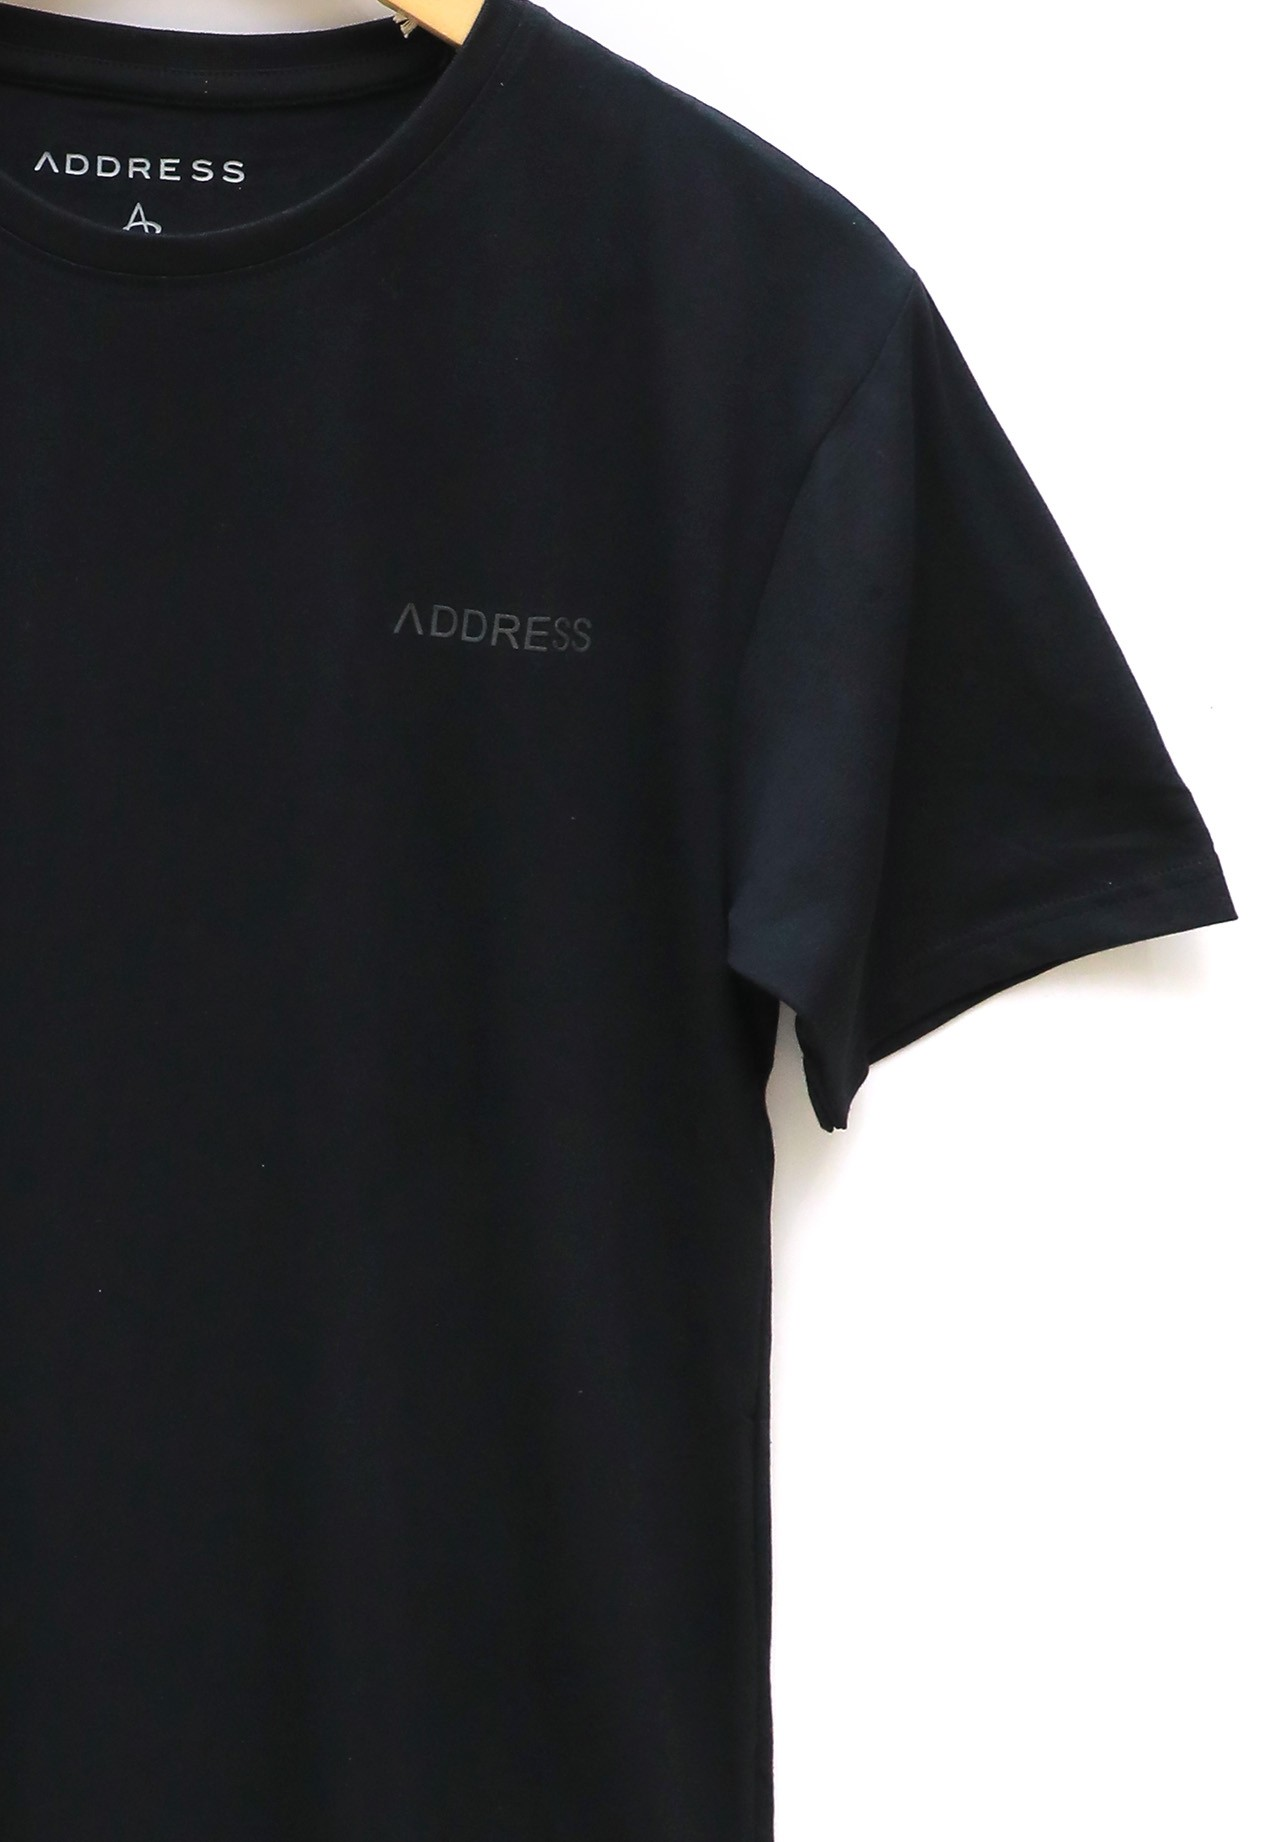 Address Black Plain T-Shirt Round Neck, XL